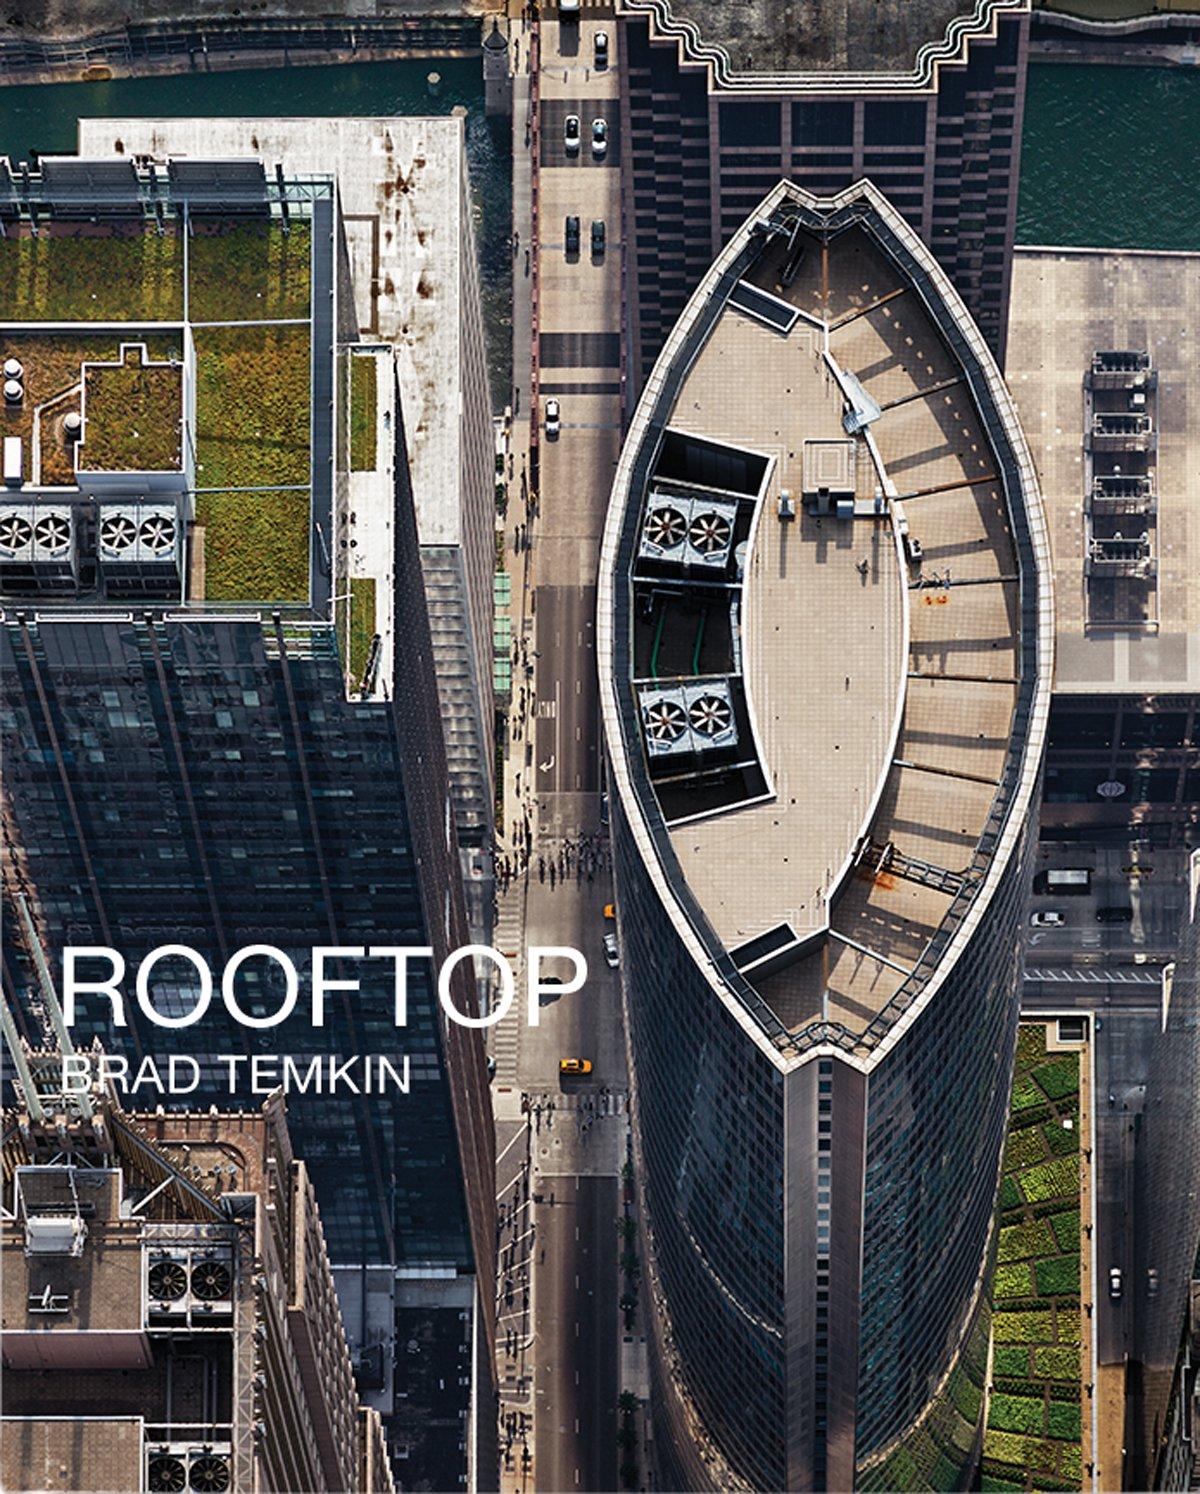 Brad Temkin: Rooftop